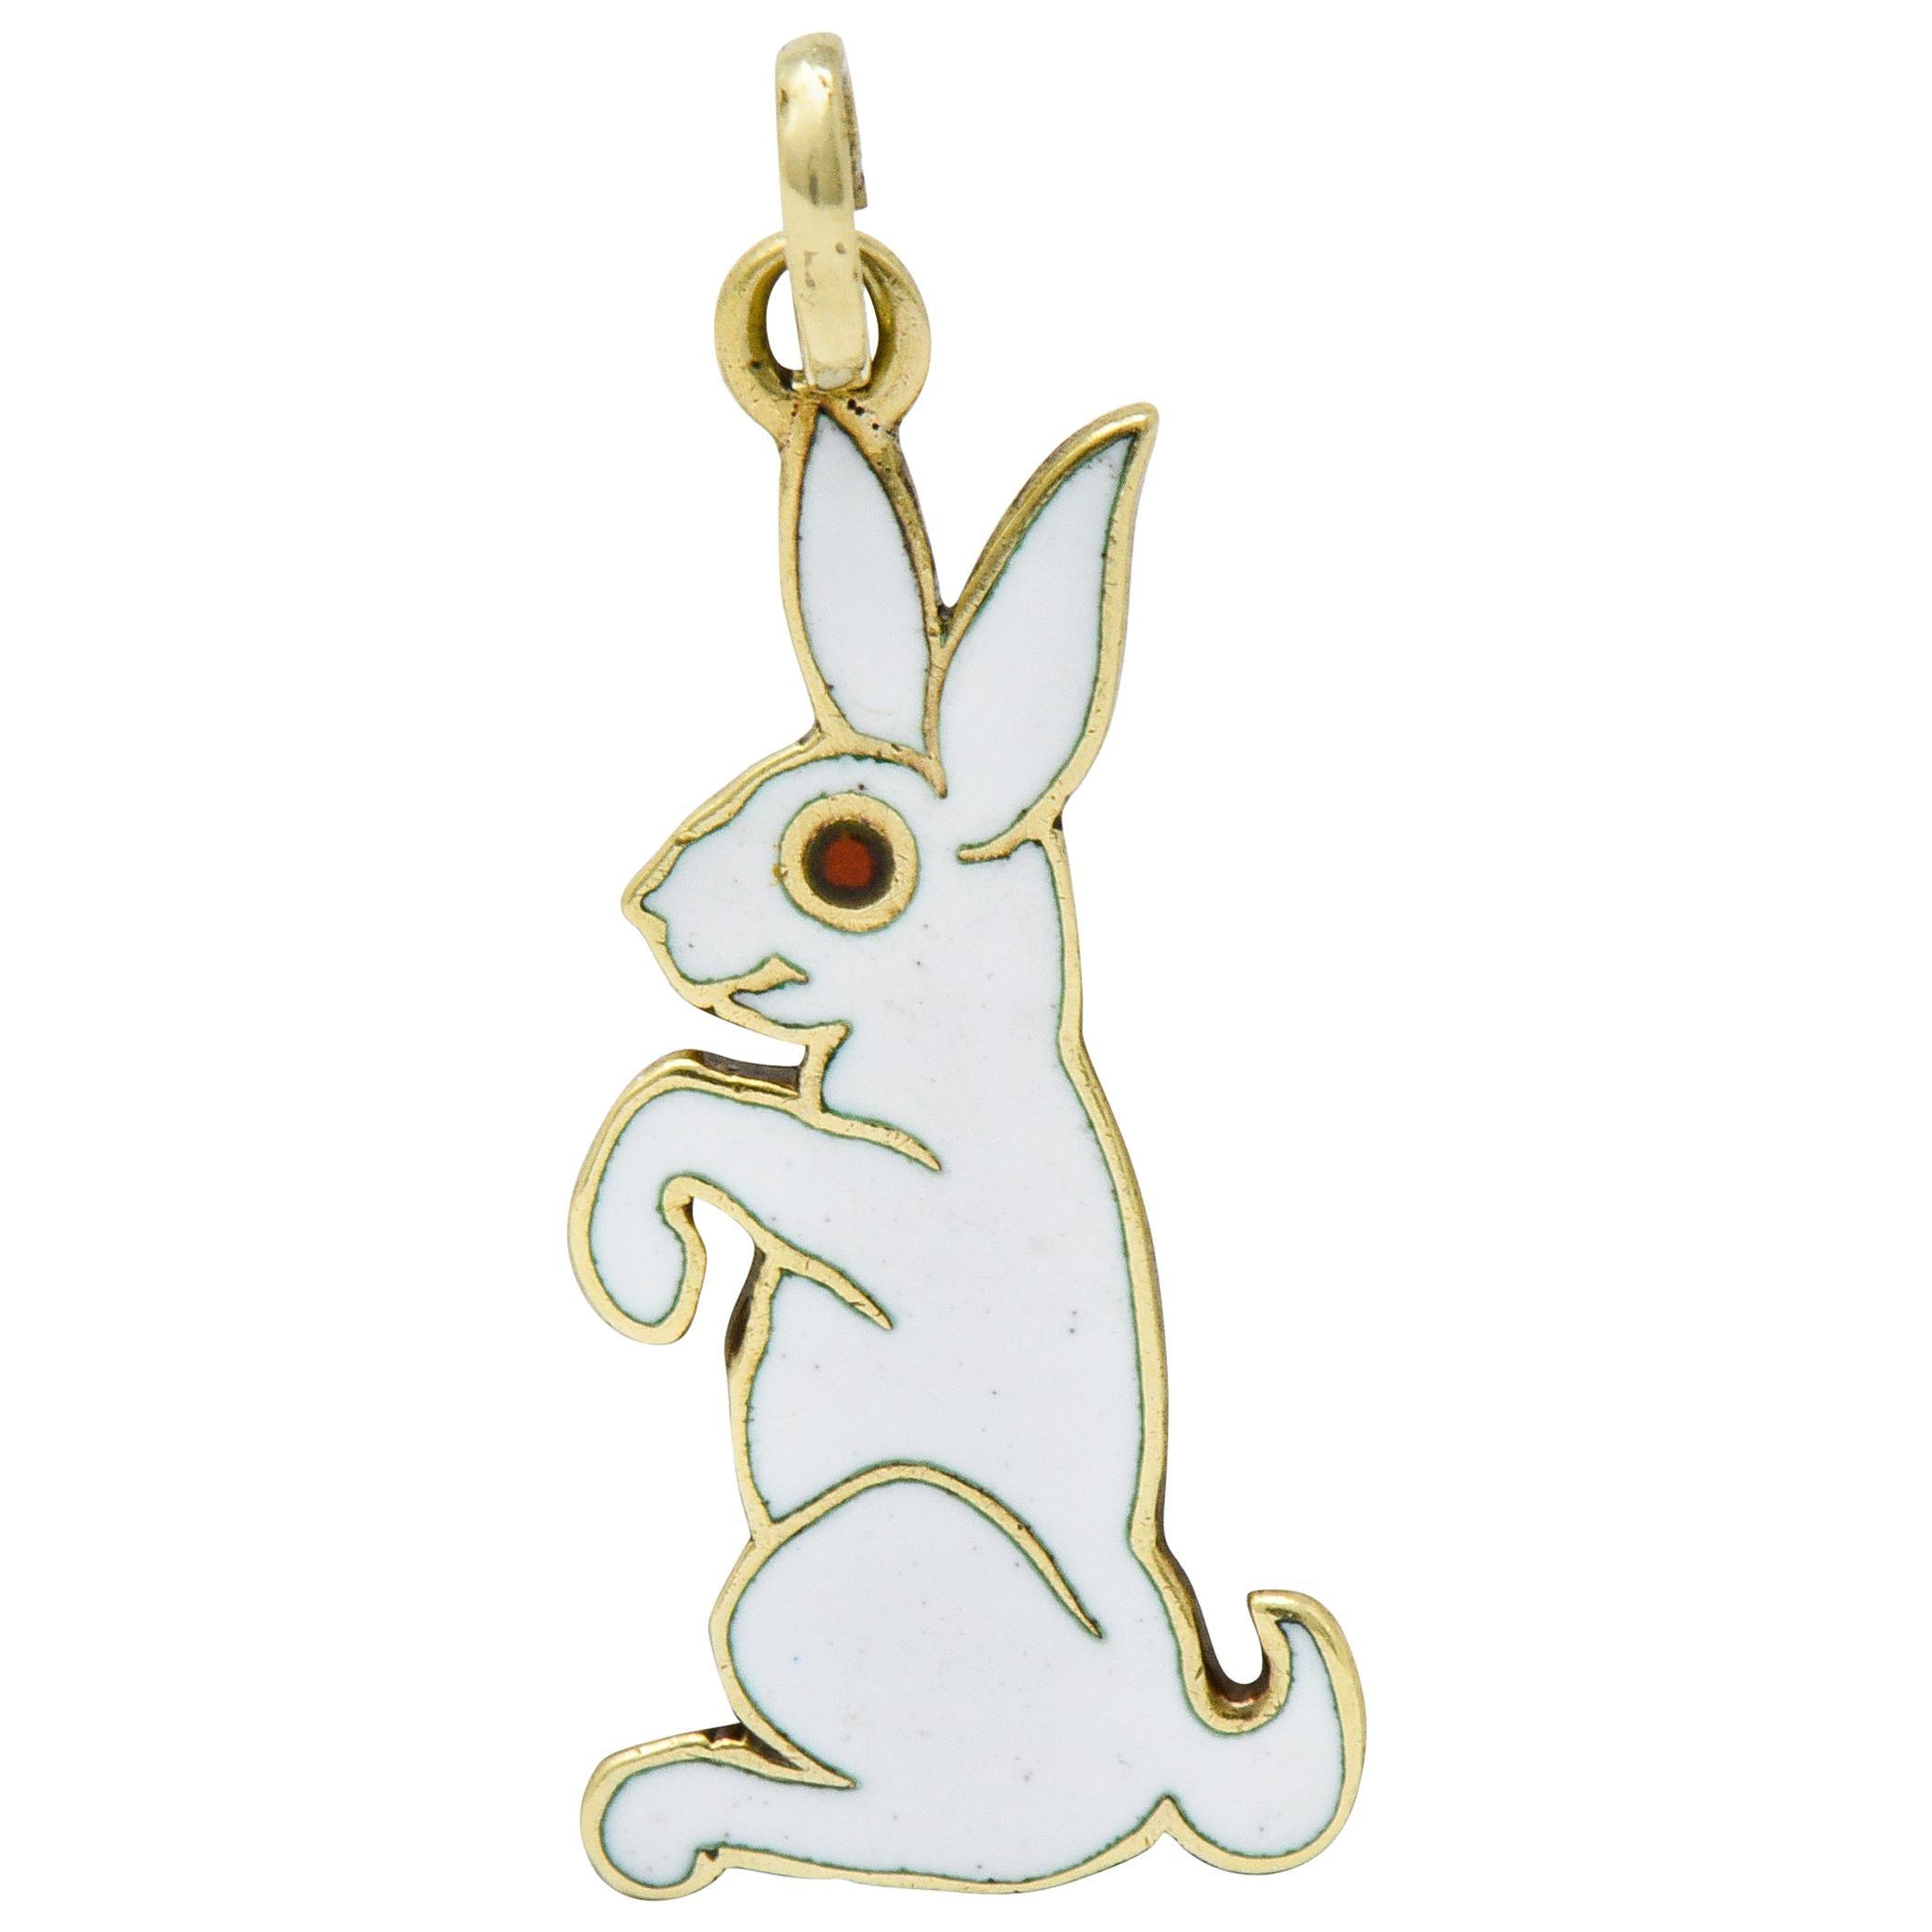 Cartier New York Art Deco Enamel 14 Karat Gold Rabbit Charm